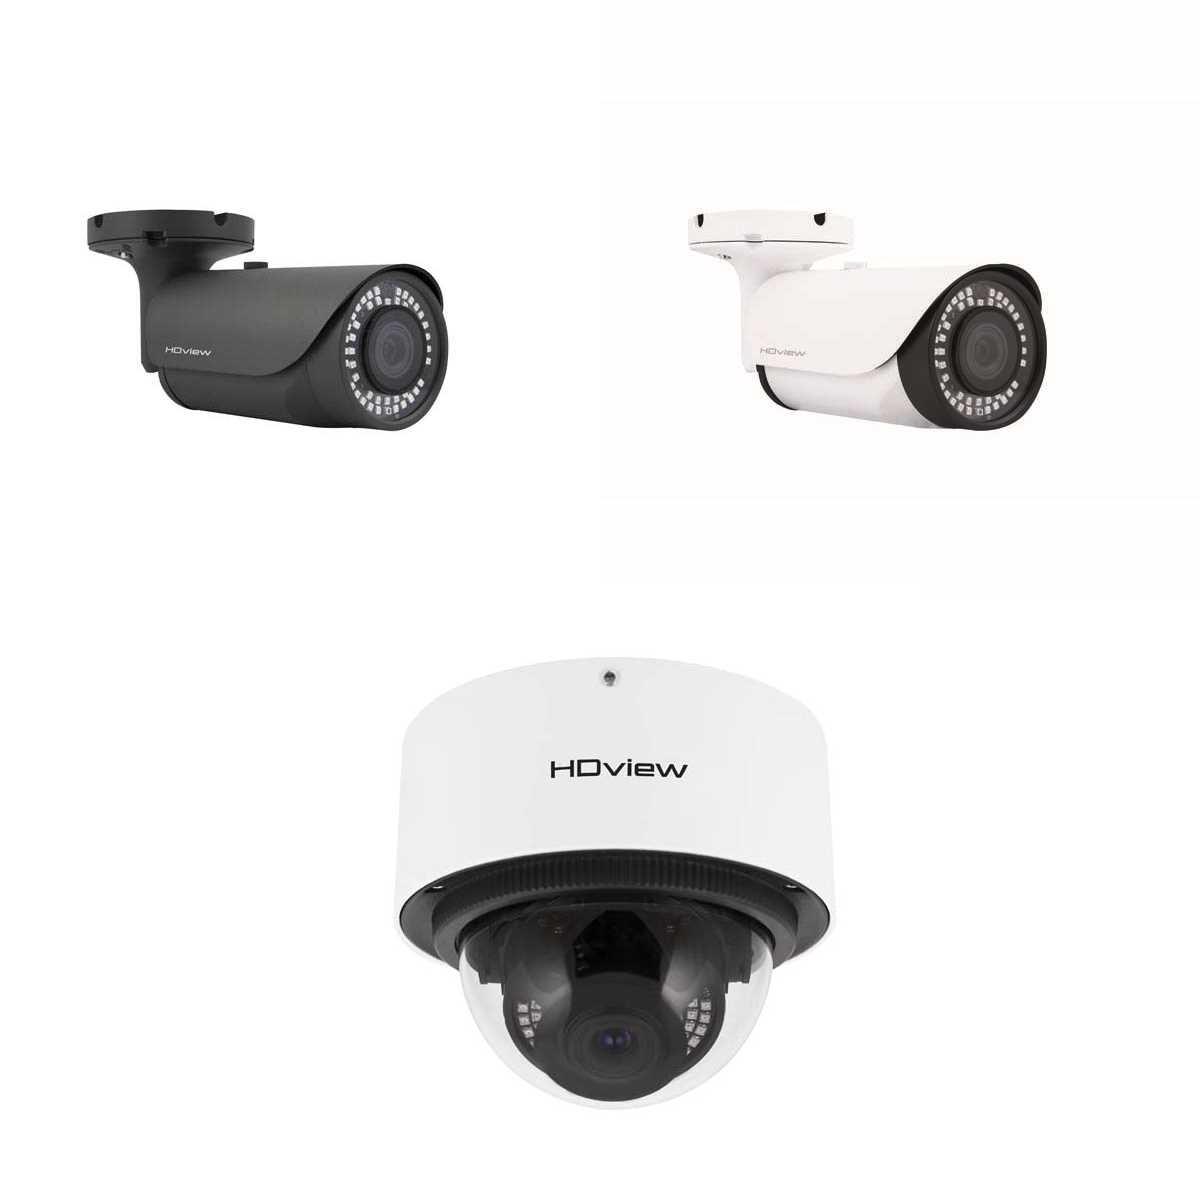 ESP 6-22mm Lens 4MP Super HD Grey White Bullet or White Dome CCTV Cameras